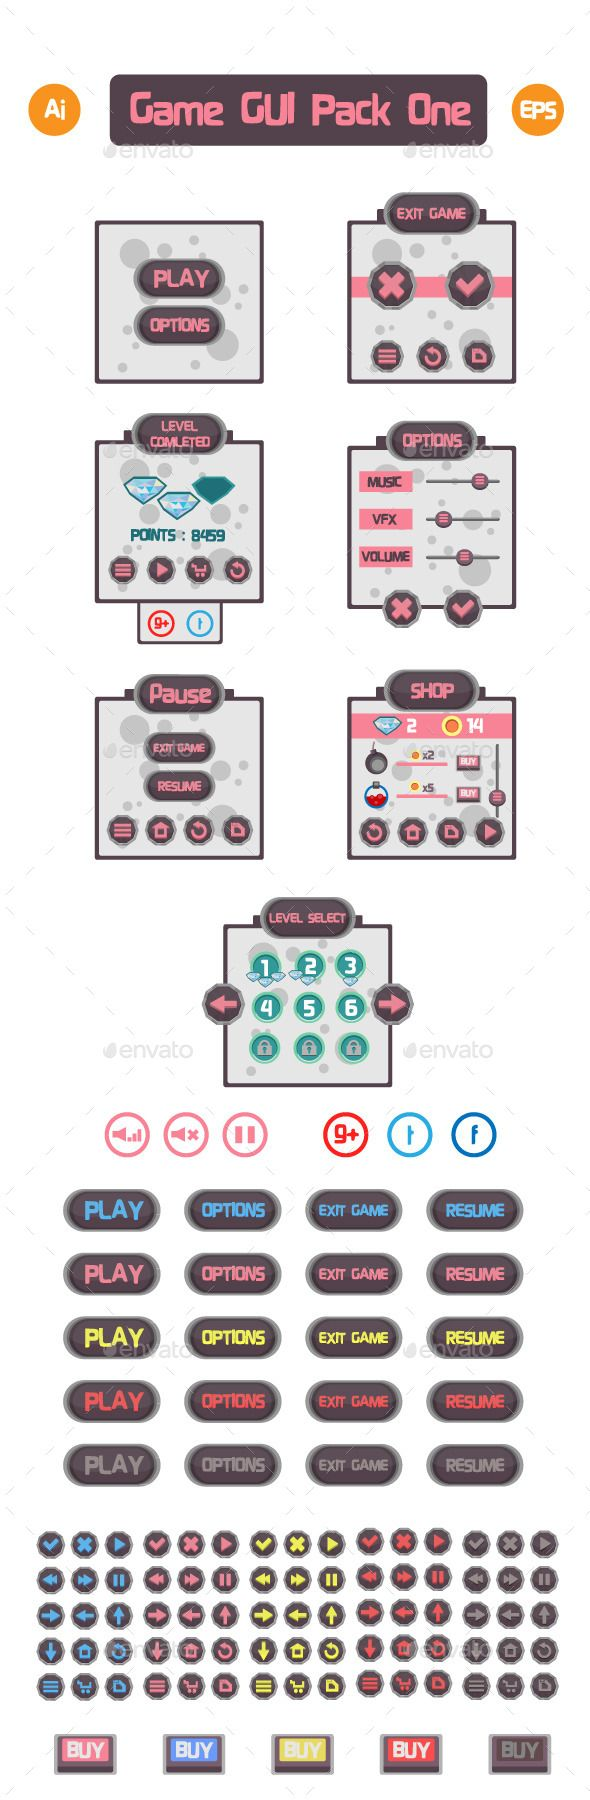 Game Gui Pack Vector EPS, AI Illustrator. Download here: https://graphicriver.net/item/game-gui-pack-one/10681162?ref=ksioks